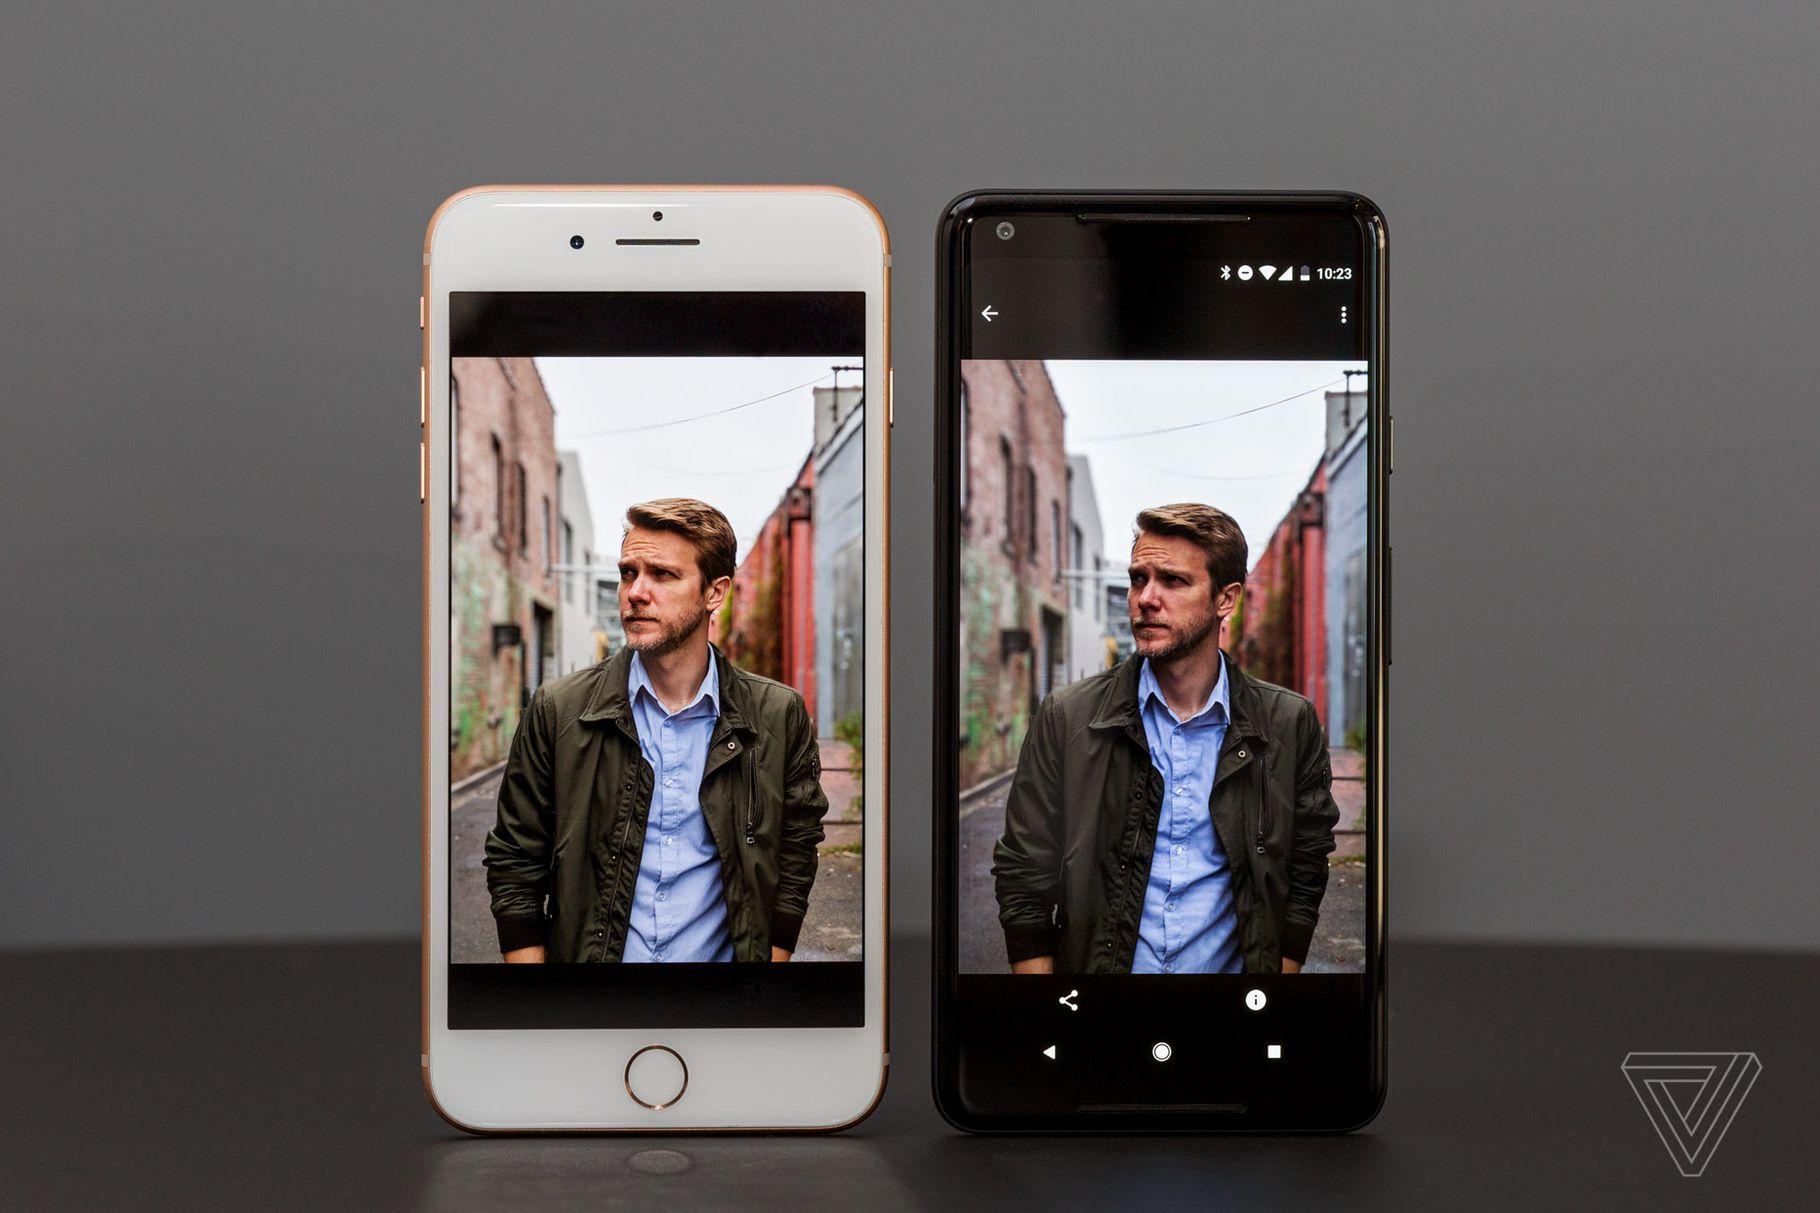 Журналисты критикуют Pixel 2 и Pixel 2 XL за плохой экран